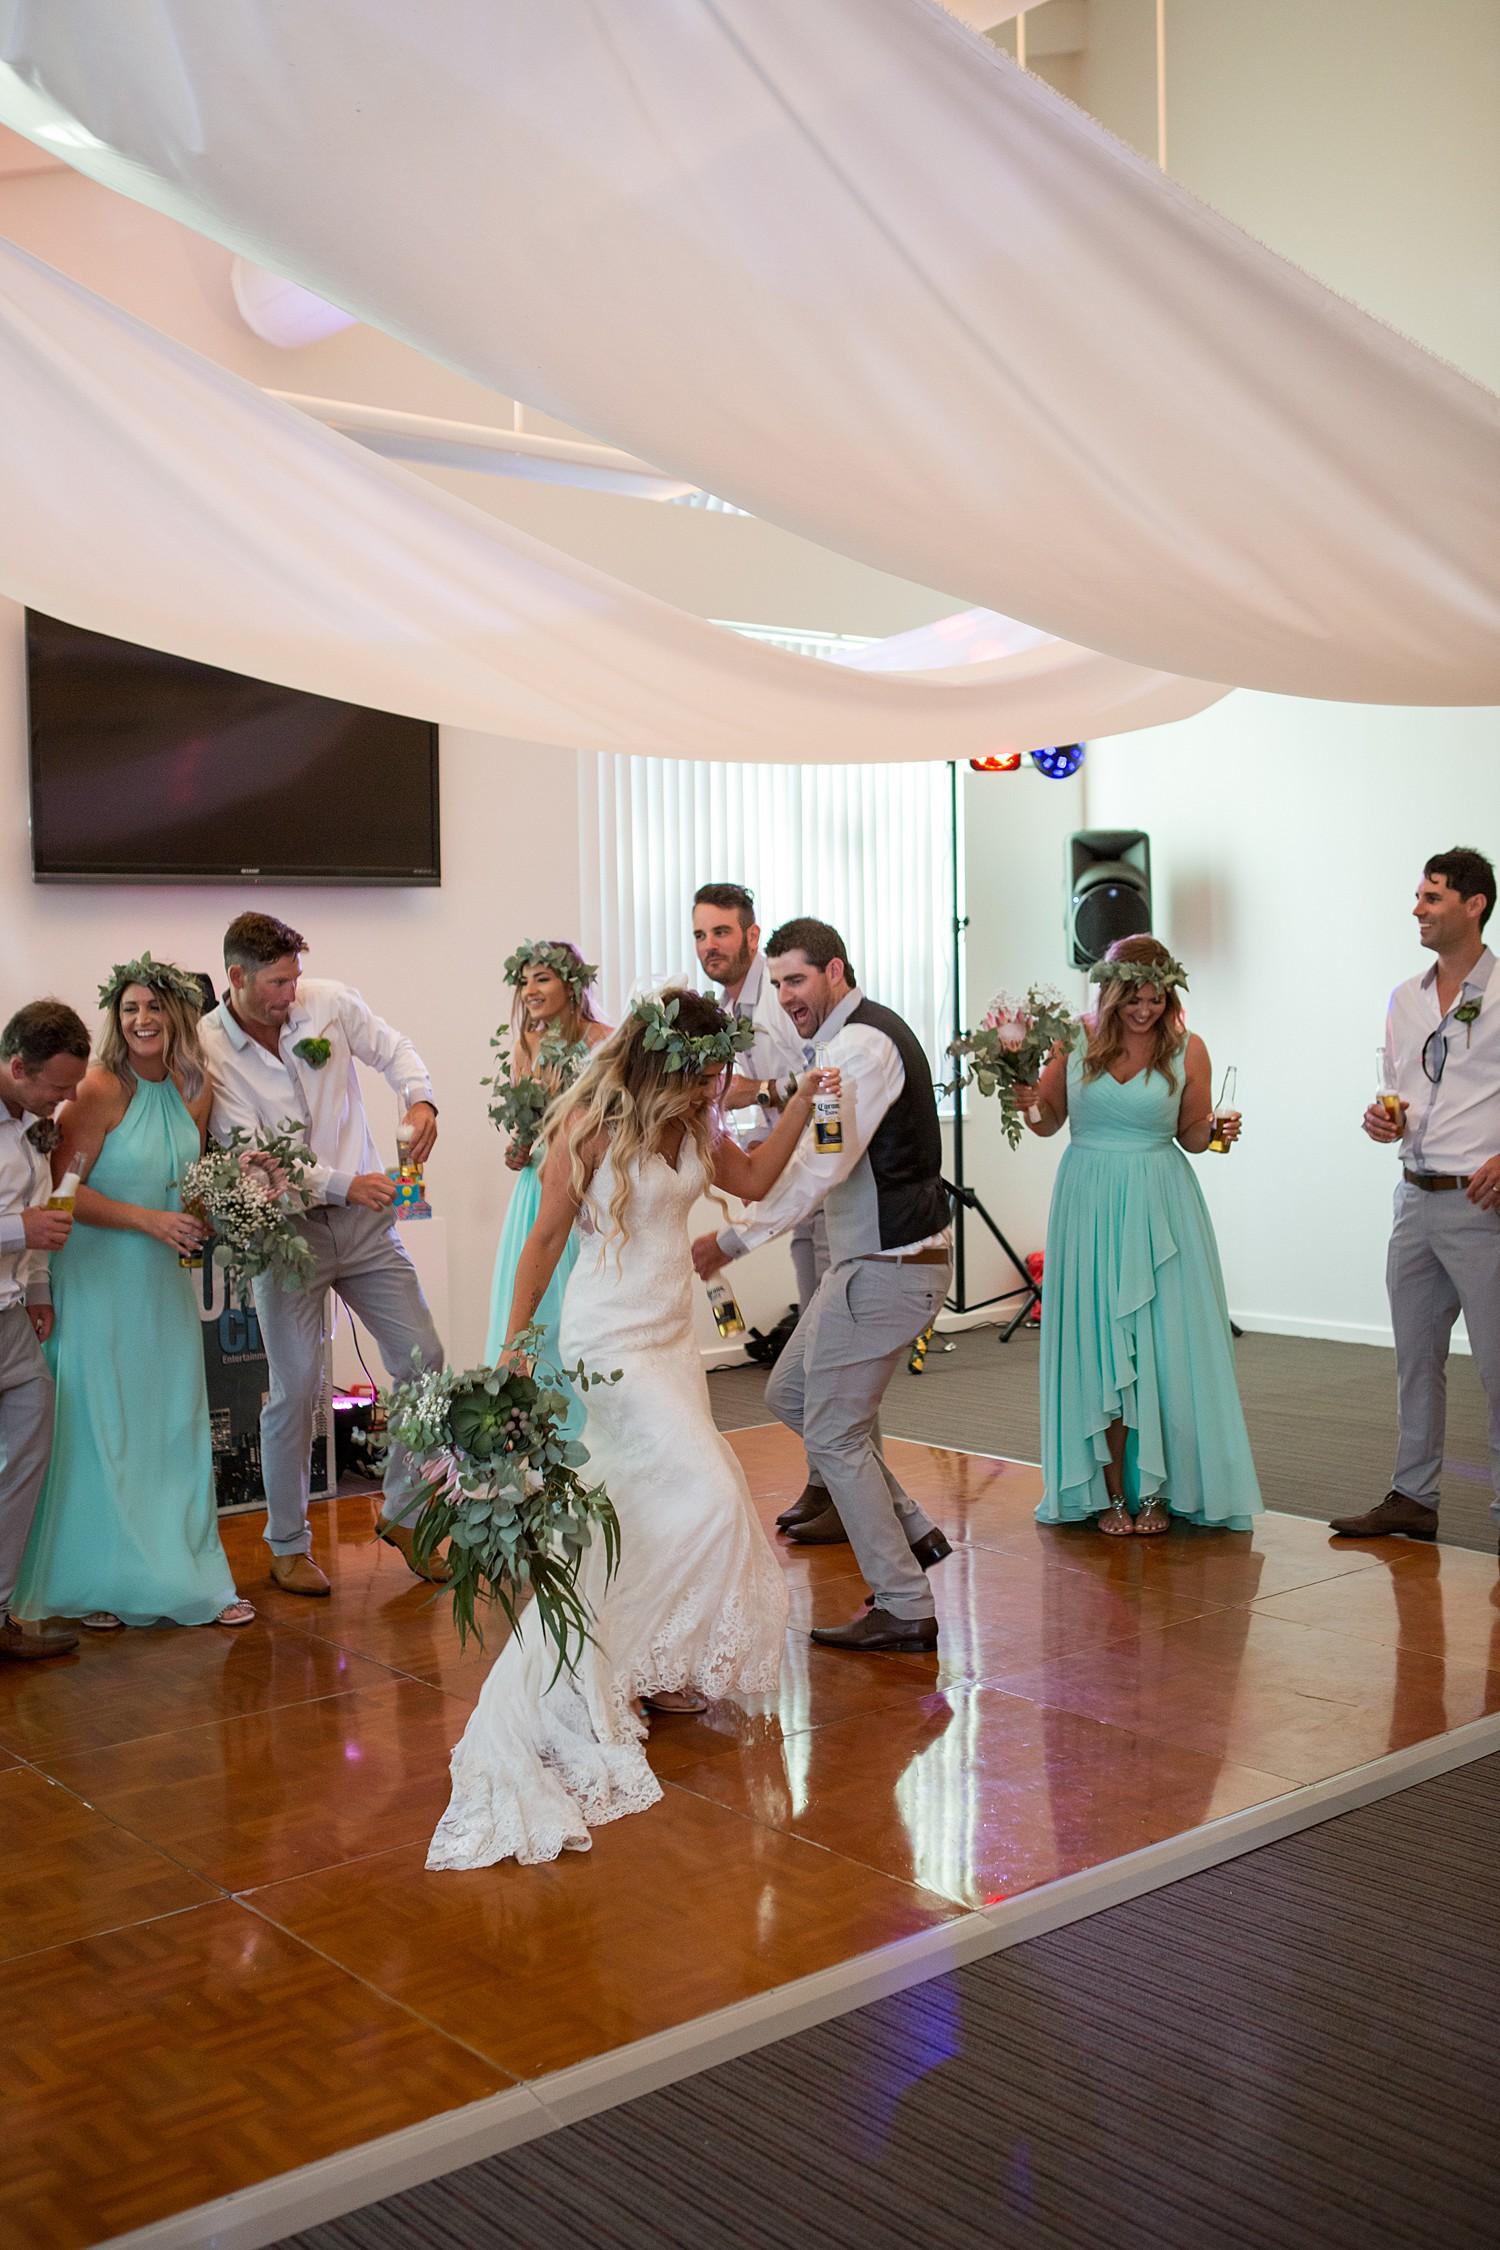 trigg_beach_wedding_perth (83).jpg